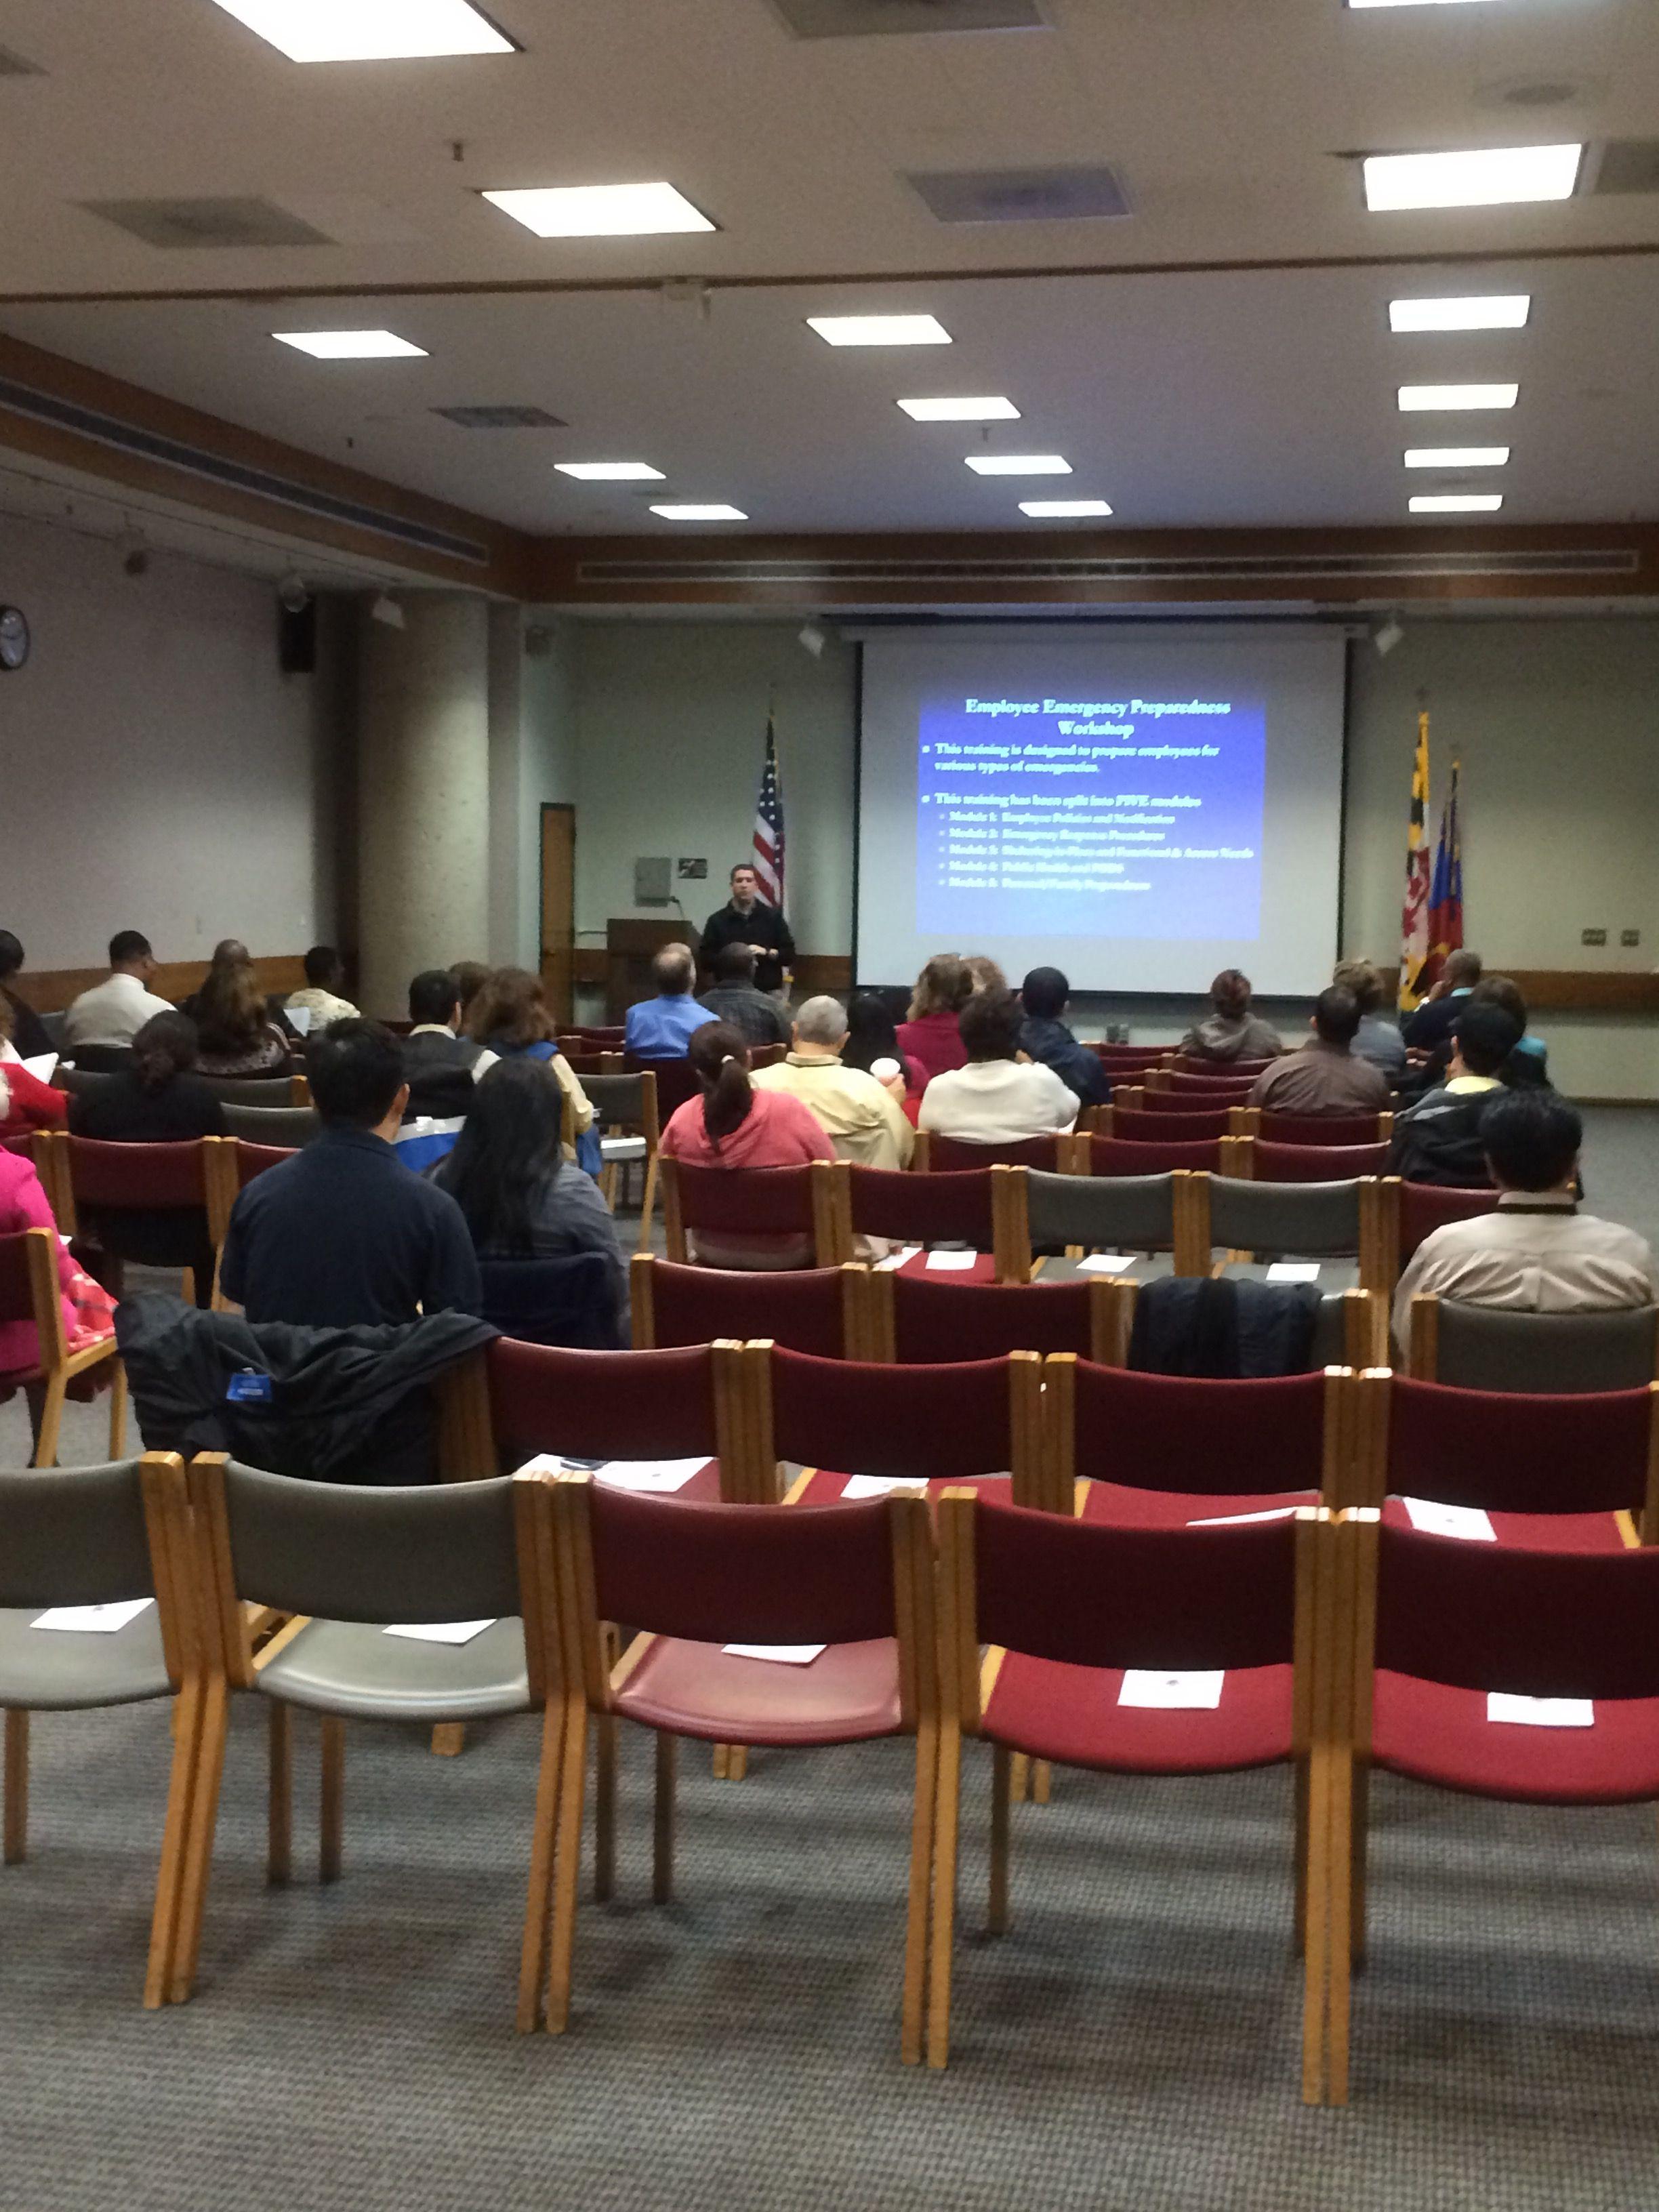 Co presenting emergency preparedness class for MoCo